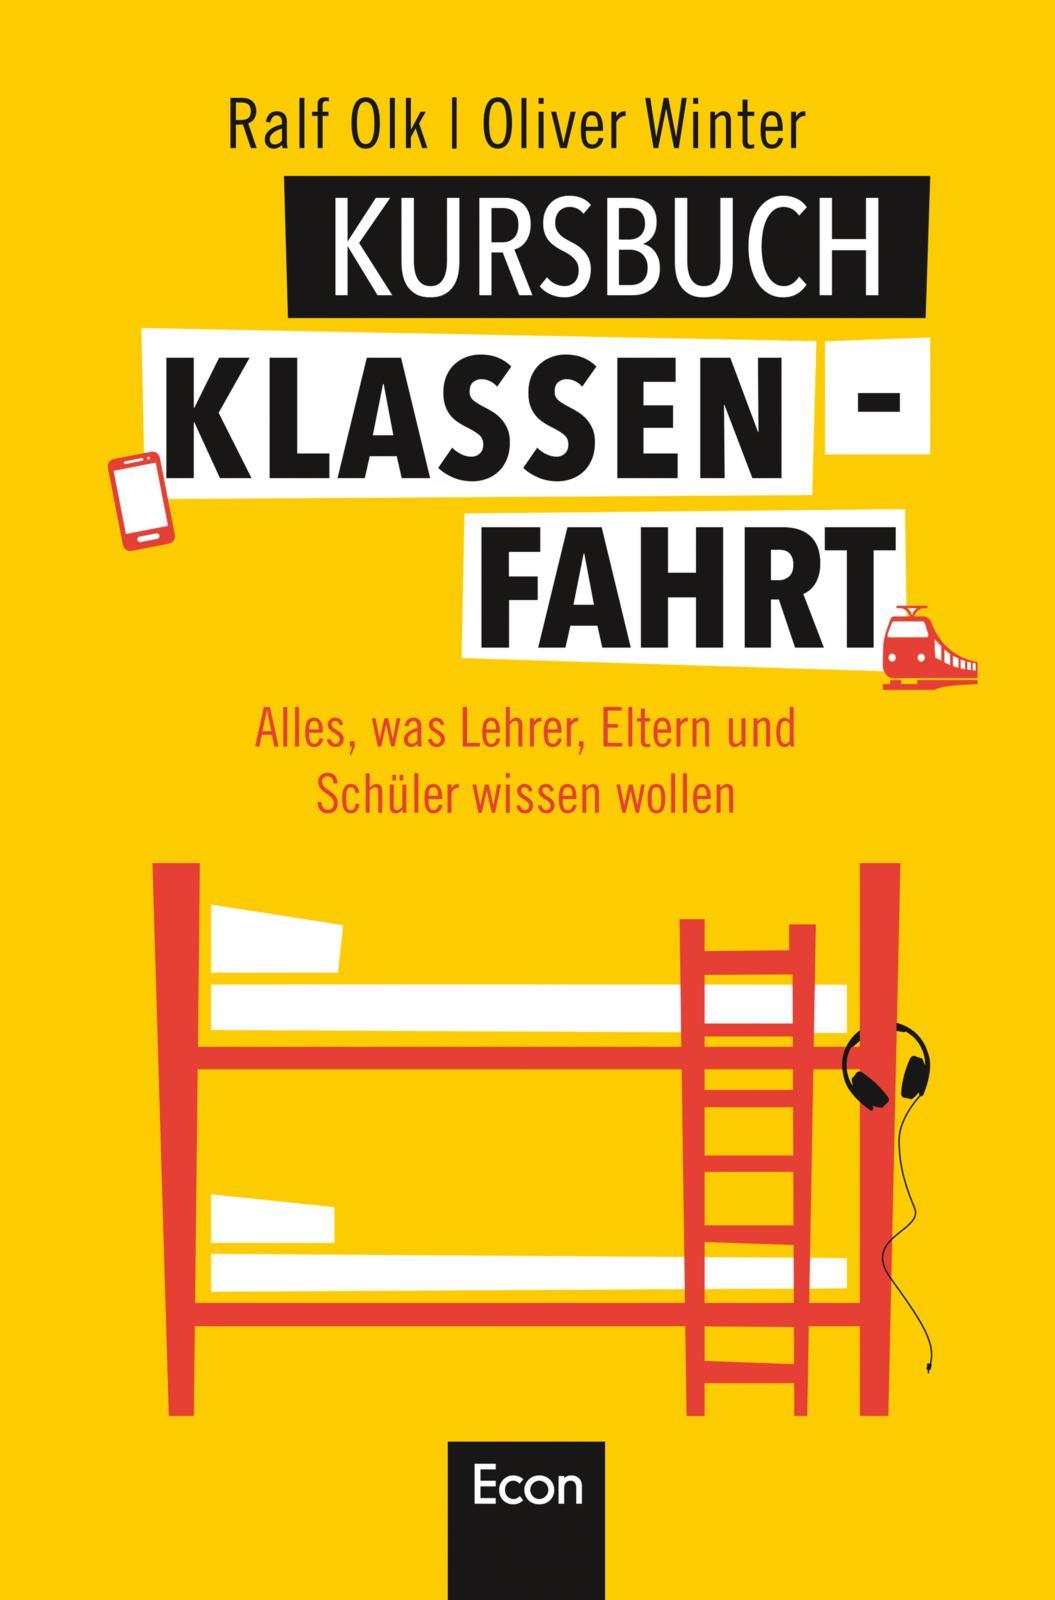 Ratgeber-Lehrkraefte Kursbuch-Klassenfahrt